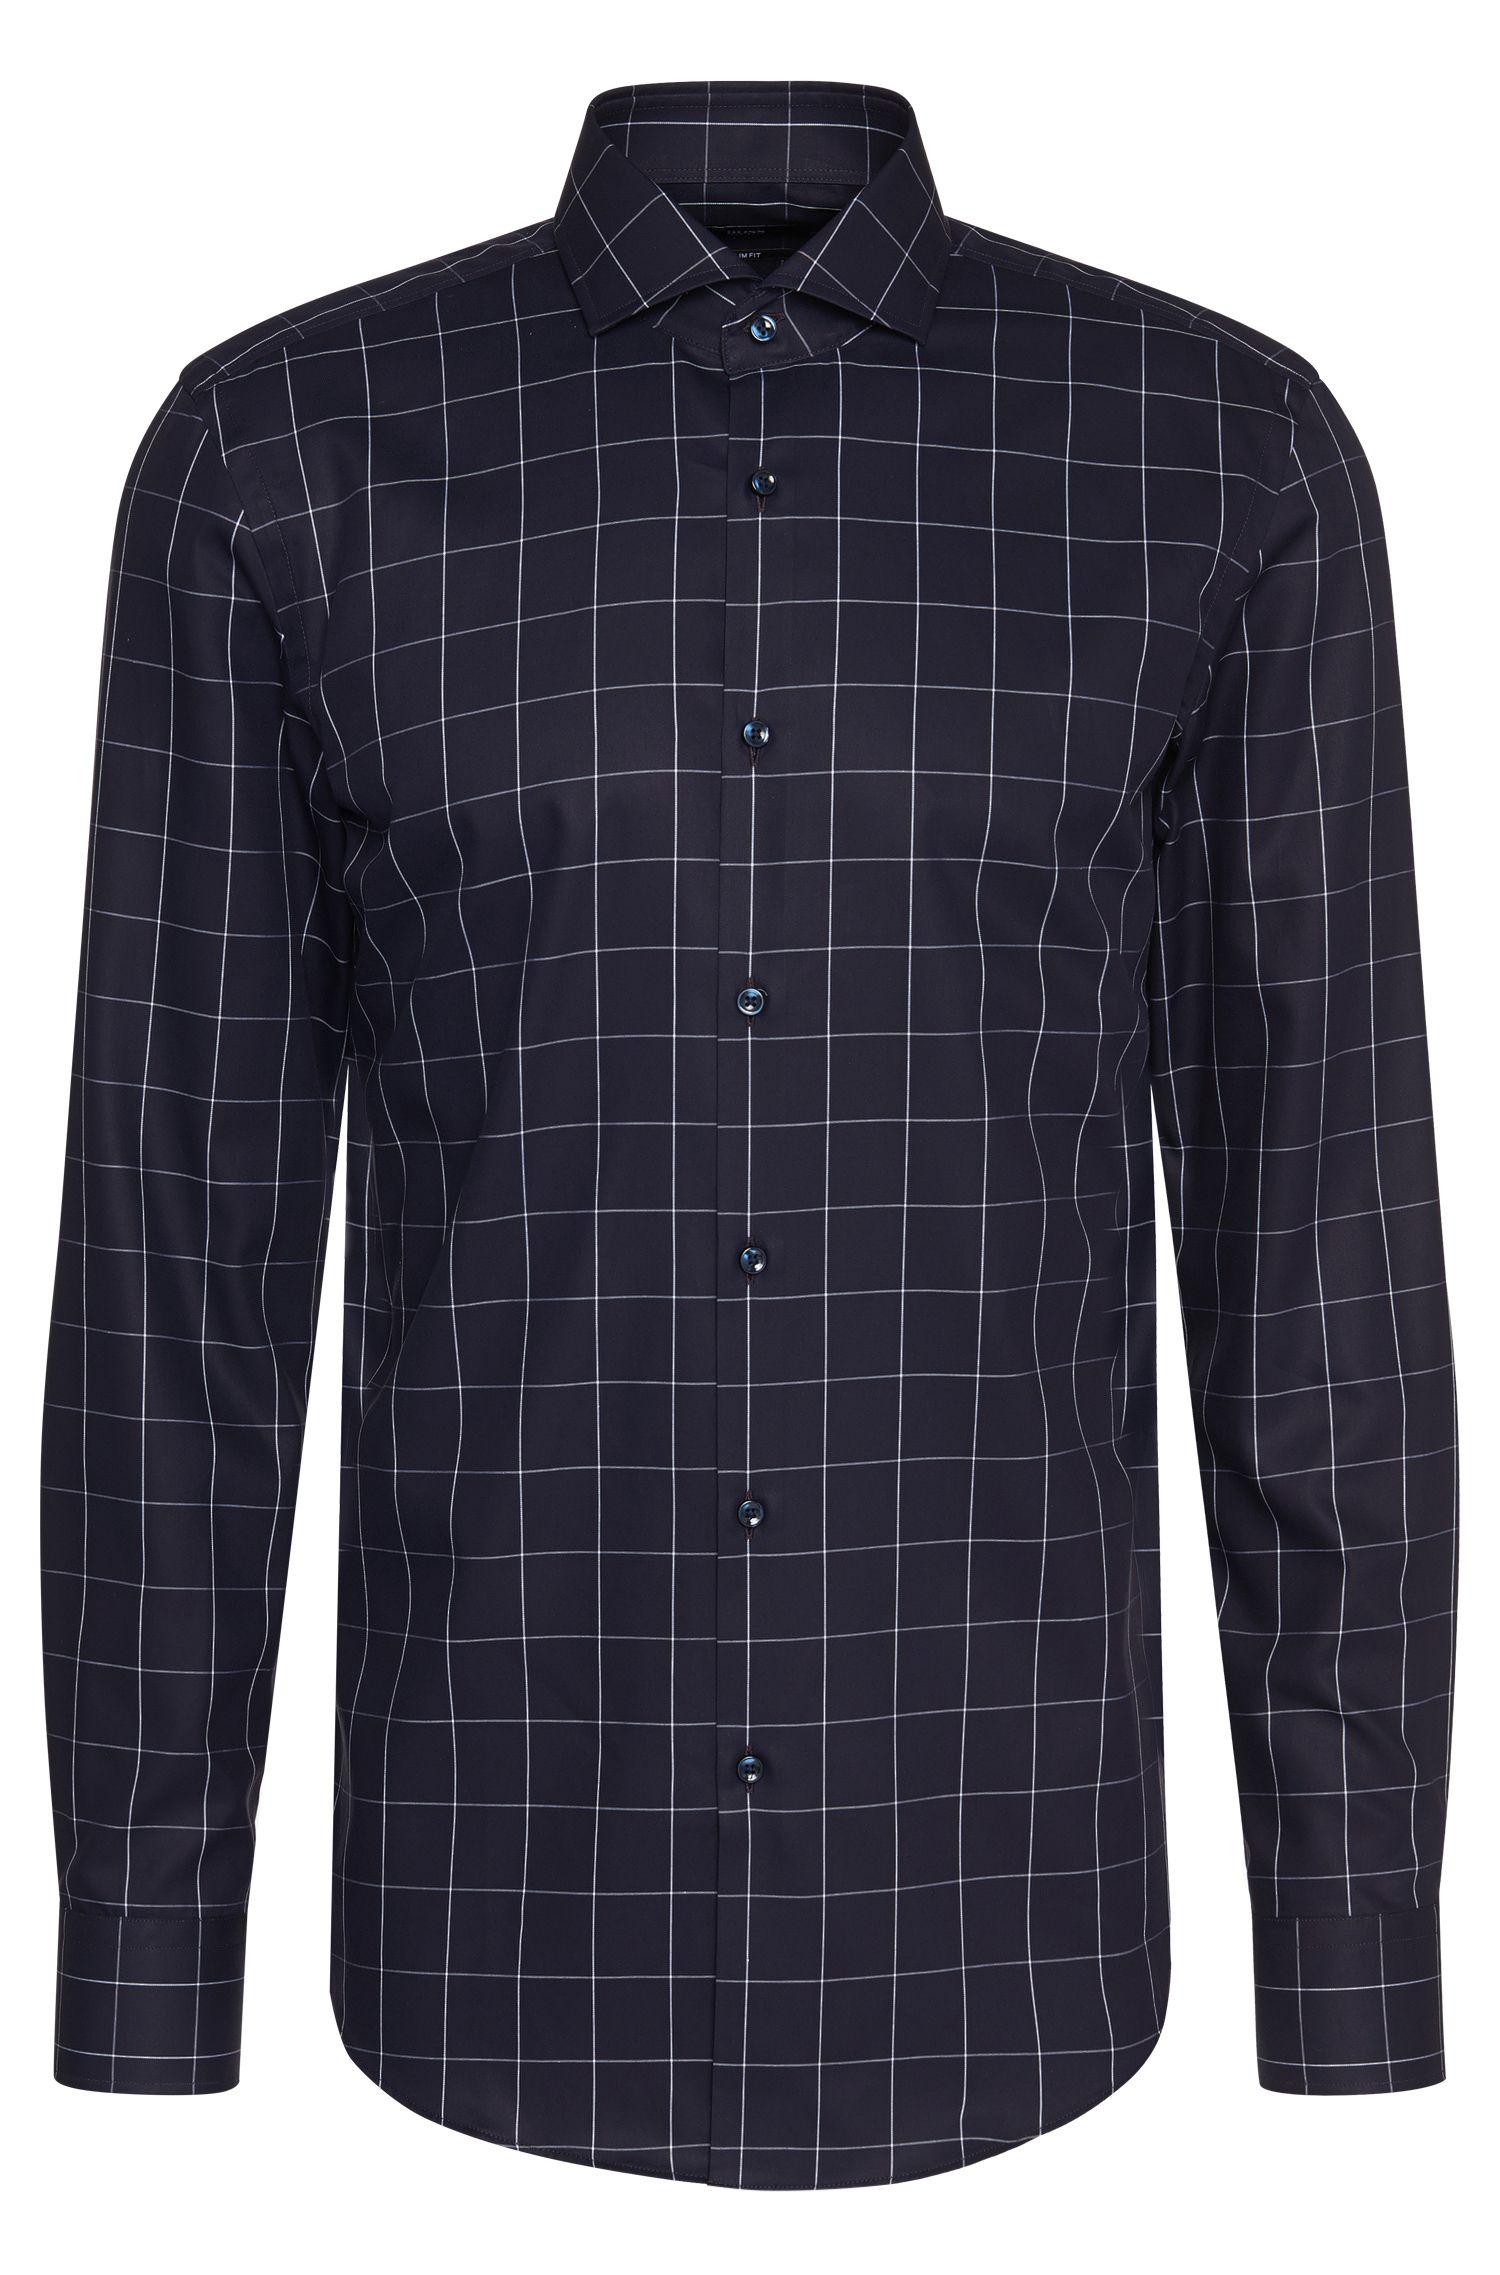 Kariertes Slim-Fit Hemd aus Baumwolle: 'Erondo'